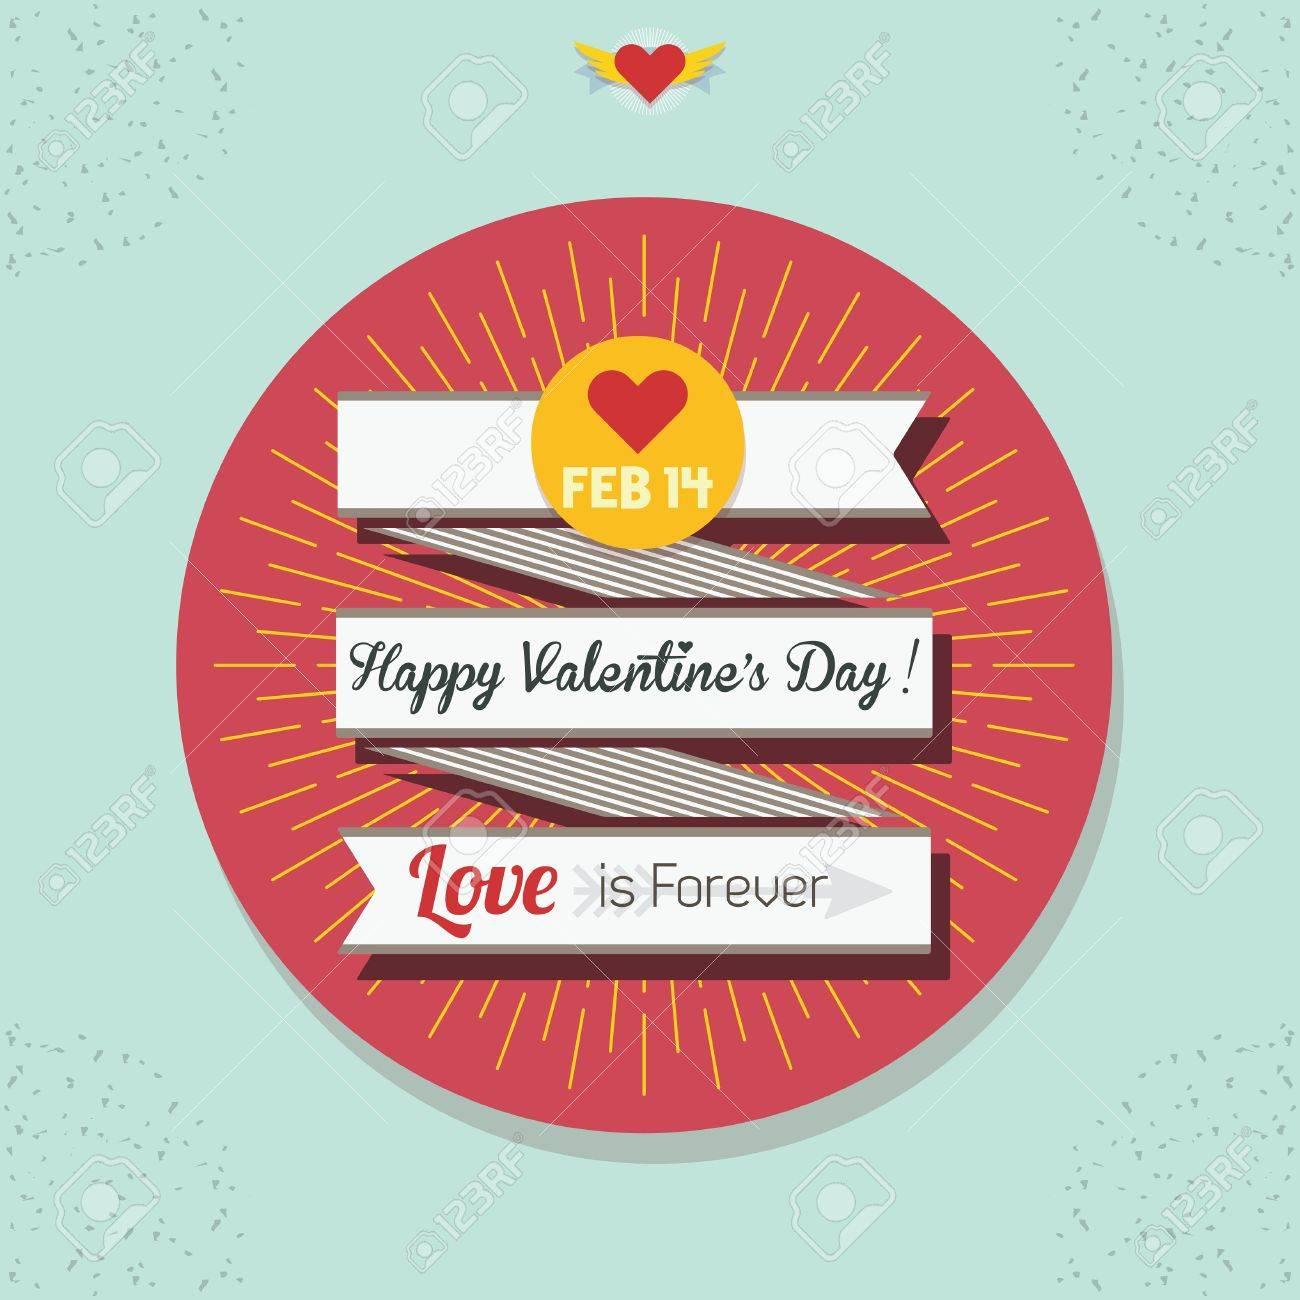 Cute Happy Valentine S Day Flat Ribbon Banner With Yellow Sunburst